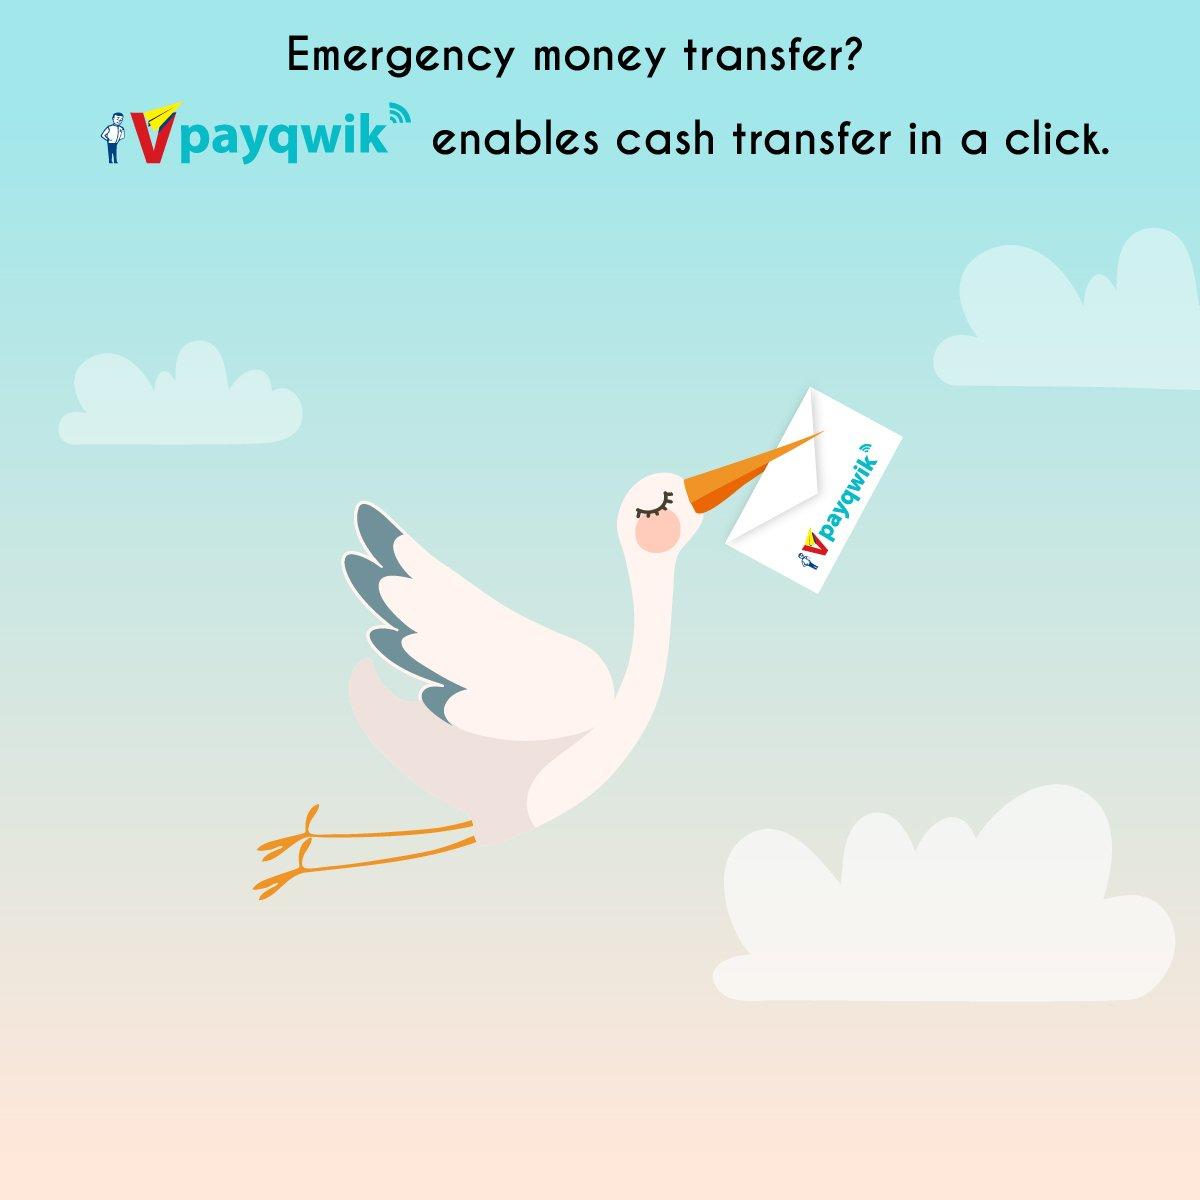 Transfer money where ever... whenever with VPayQwik! #DigitalWallet #MoneyTransfer #GoCashless #DigitalIndia<br>http://pic.twitter.com/rwj93qCDpC